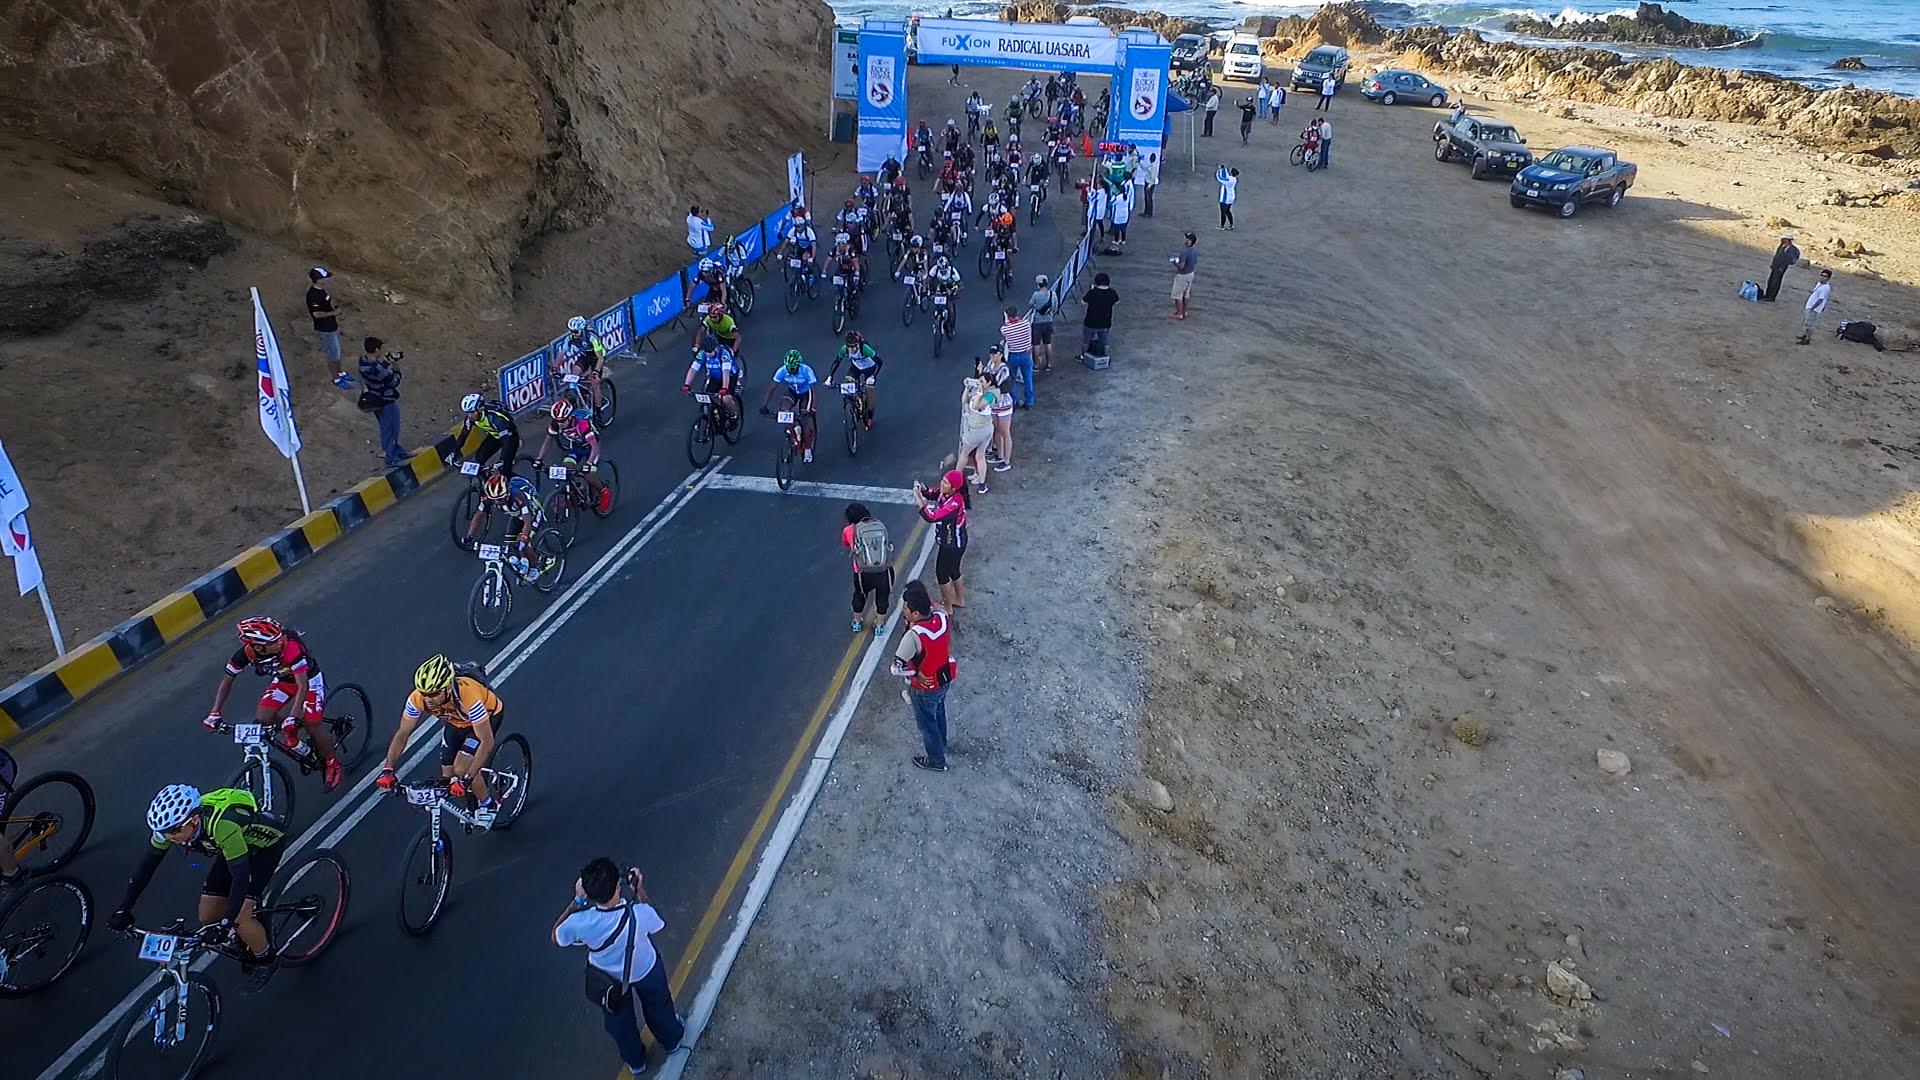 eventos de ciclismo de montaña